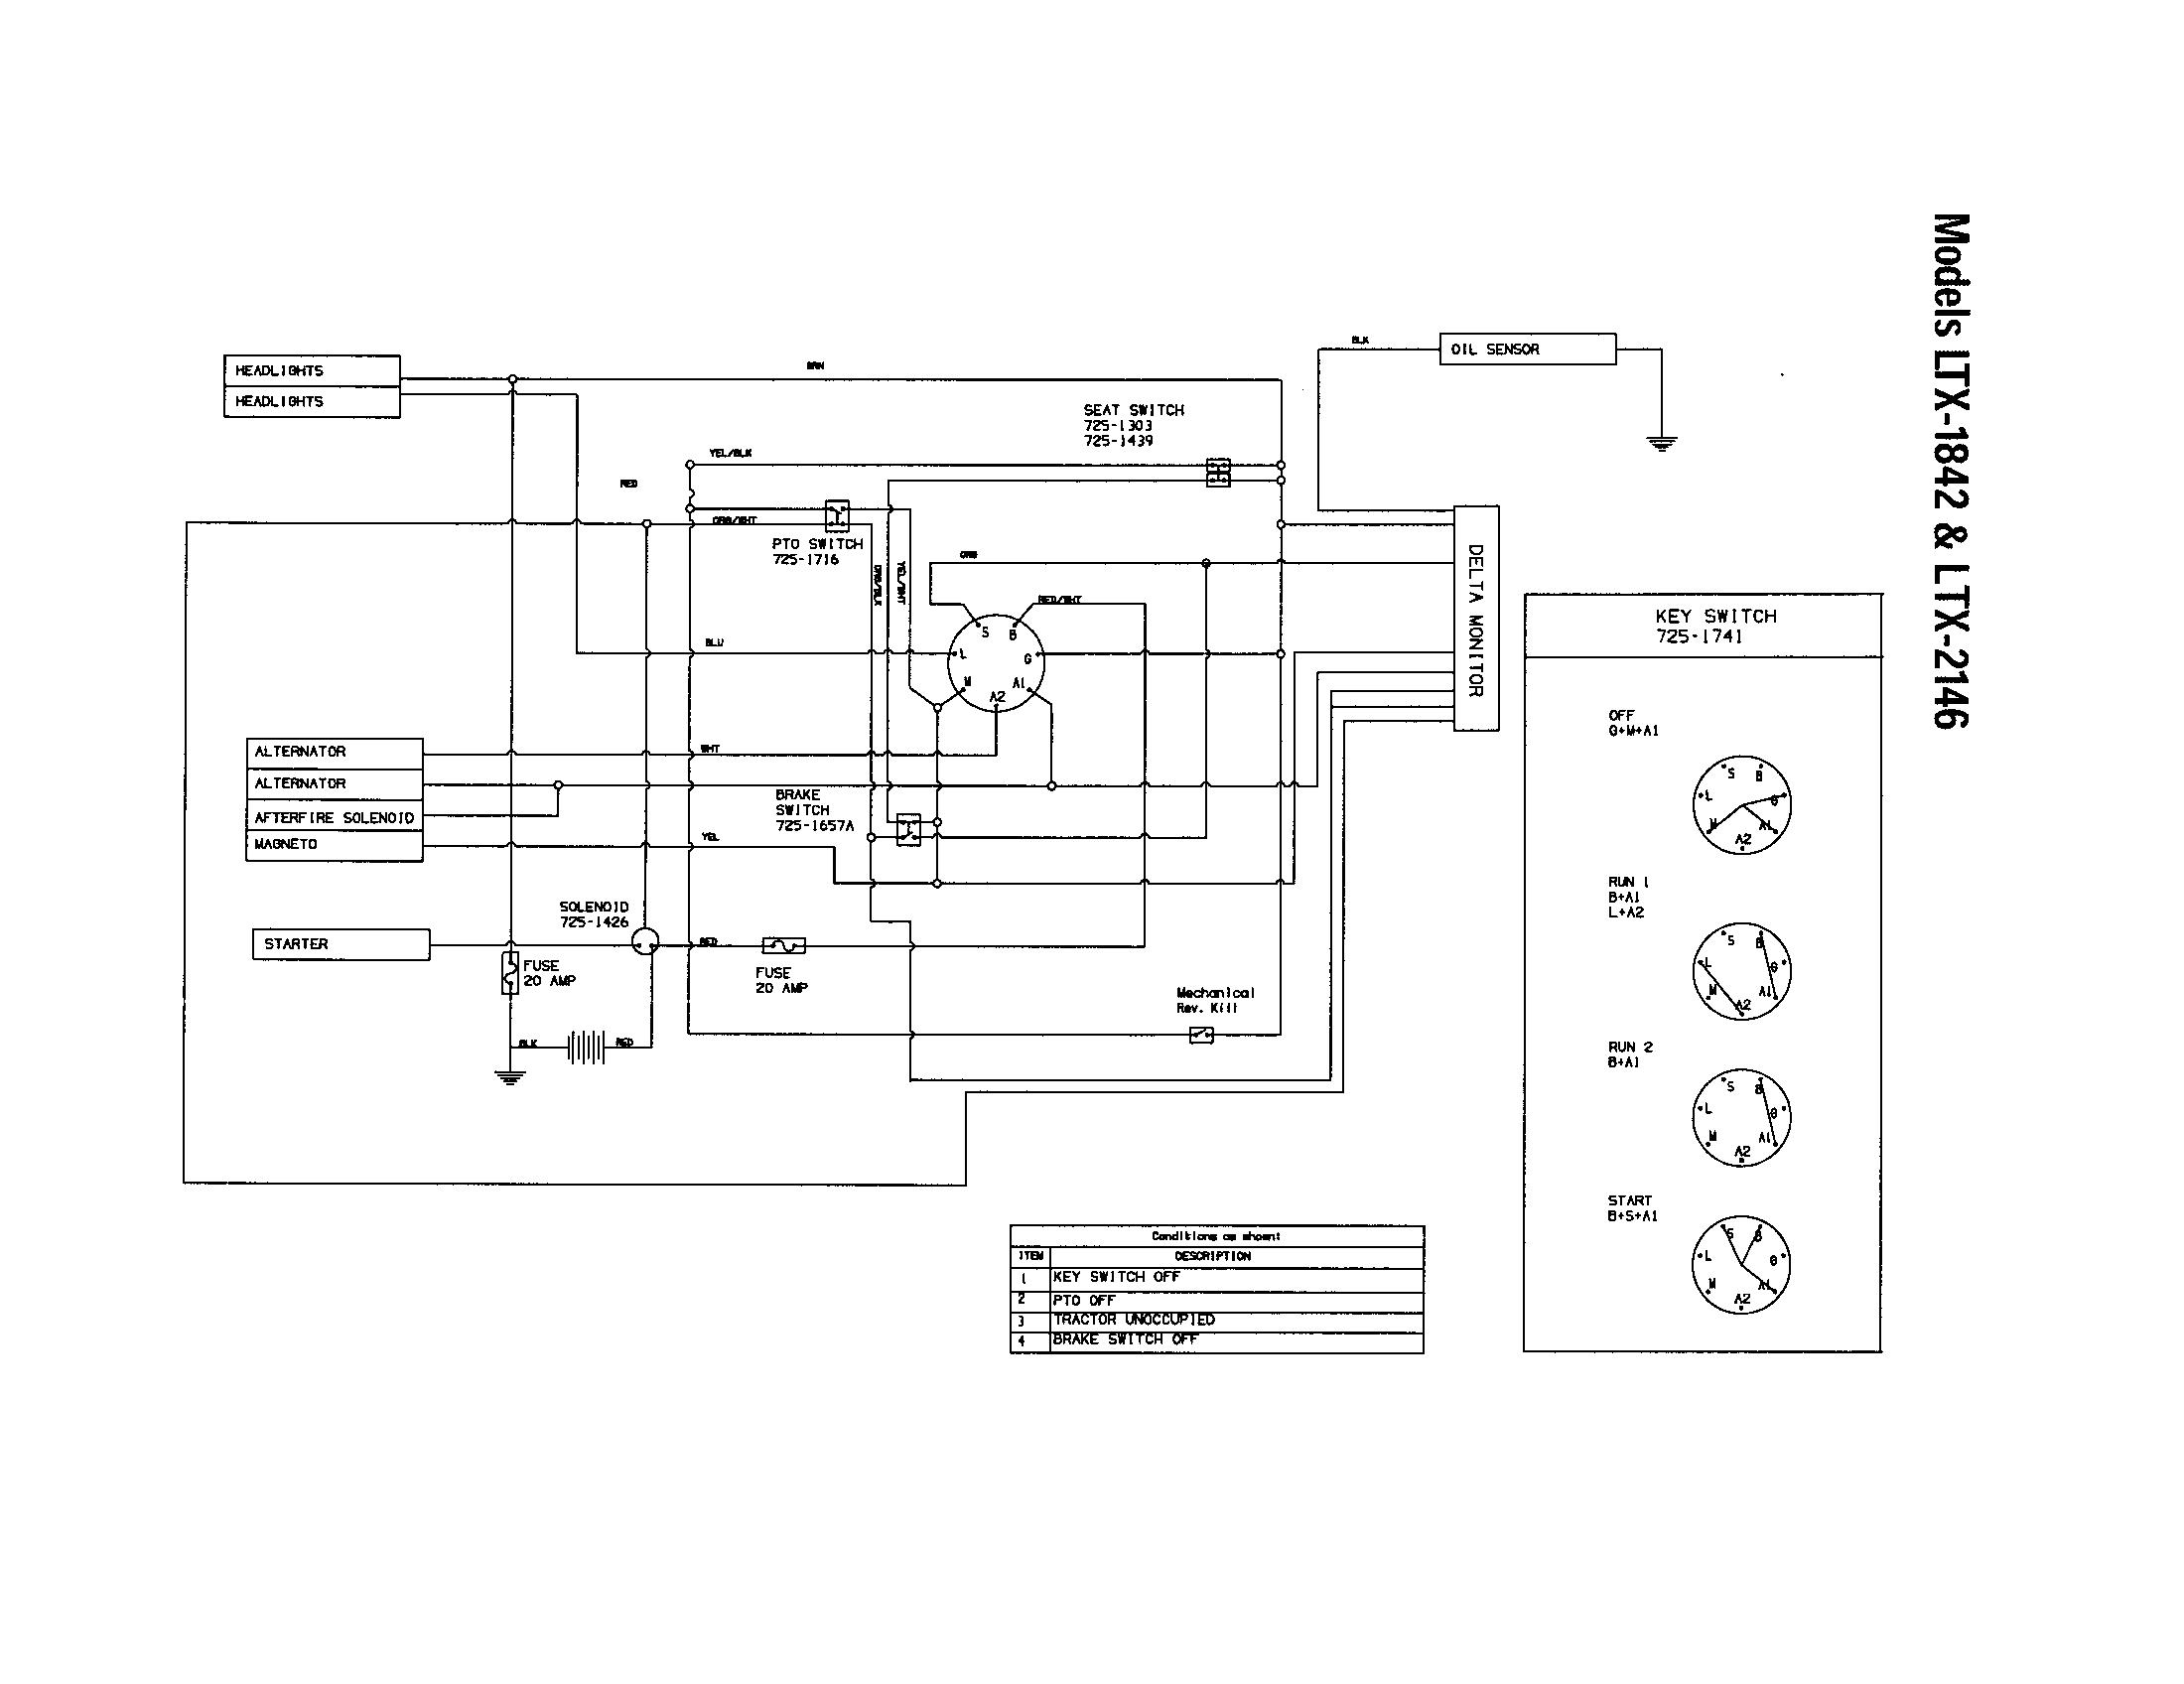 hight resolution of troy bilt mower wiring diagram use wiring diagram troy bilt riding lawn mower wiring diagram troy bilt pony lawn tractor wiring diagram